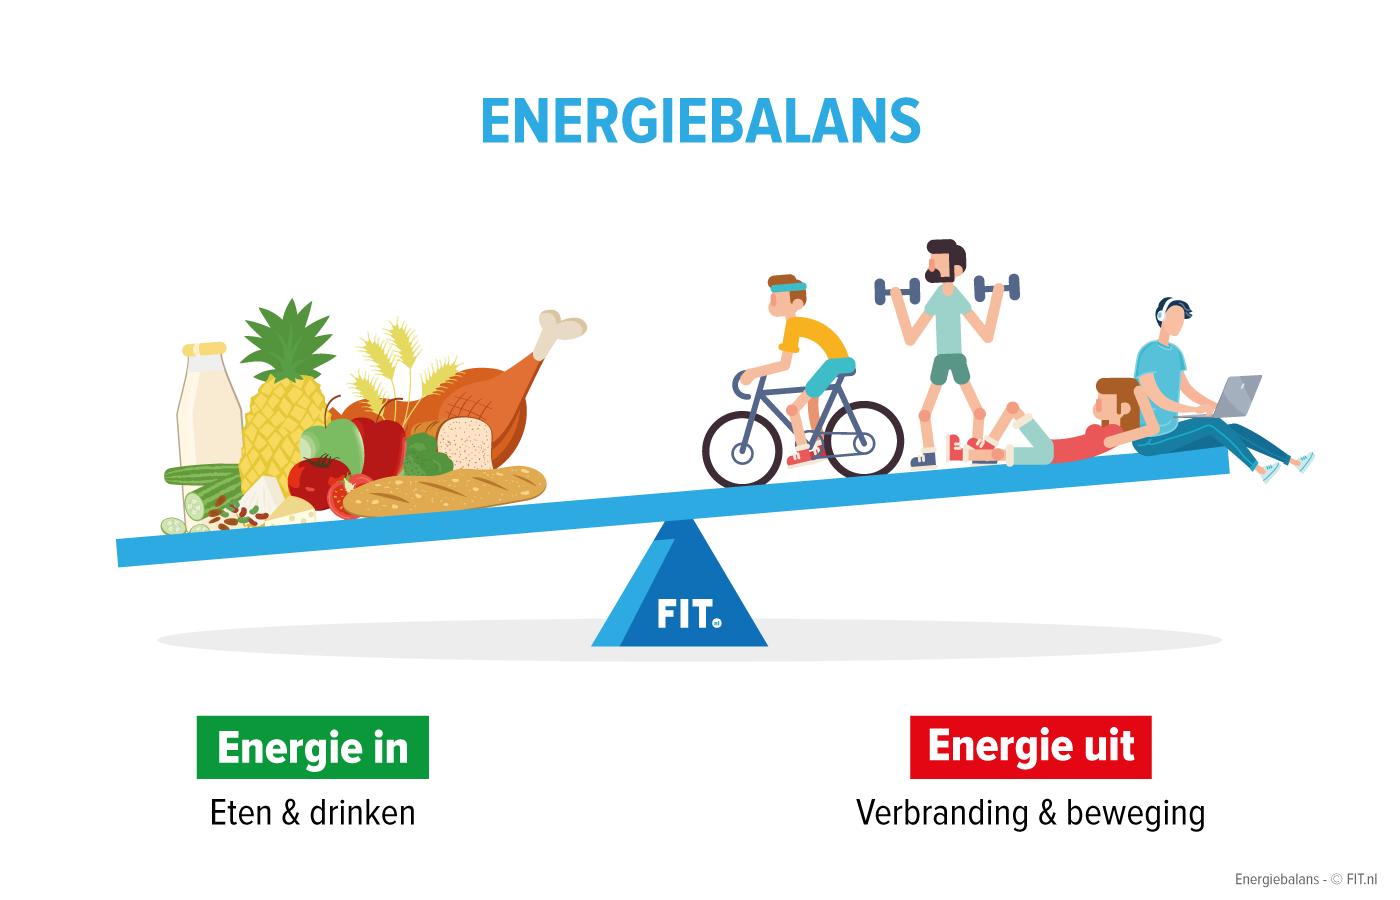 energiebalans